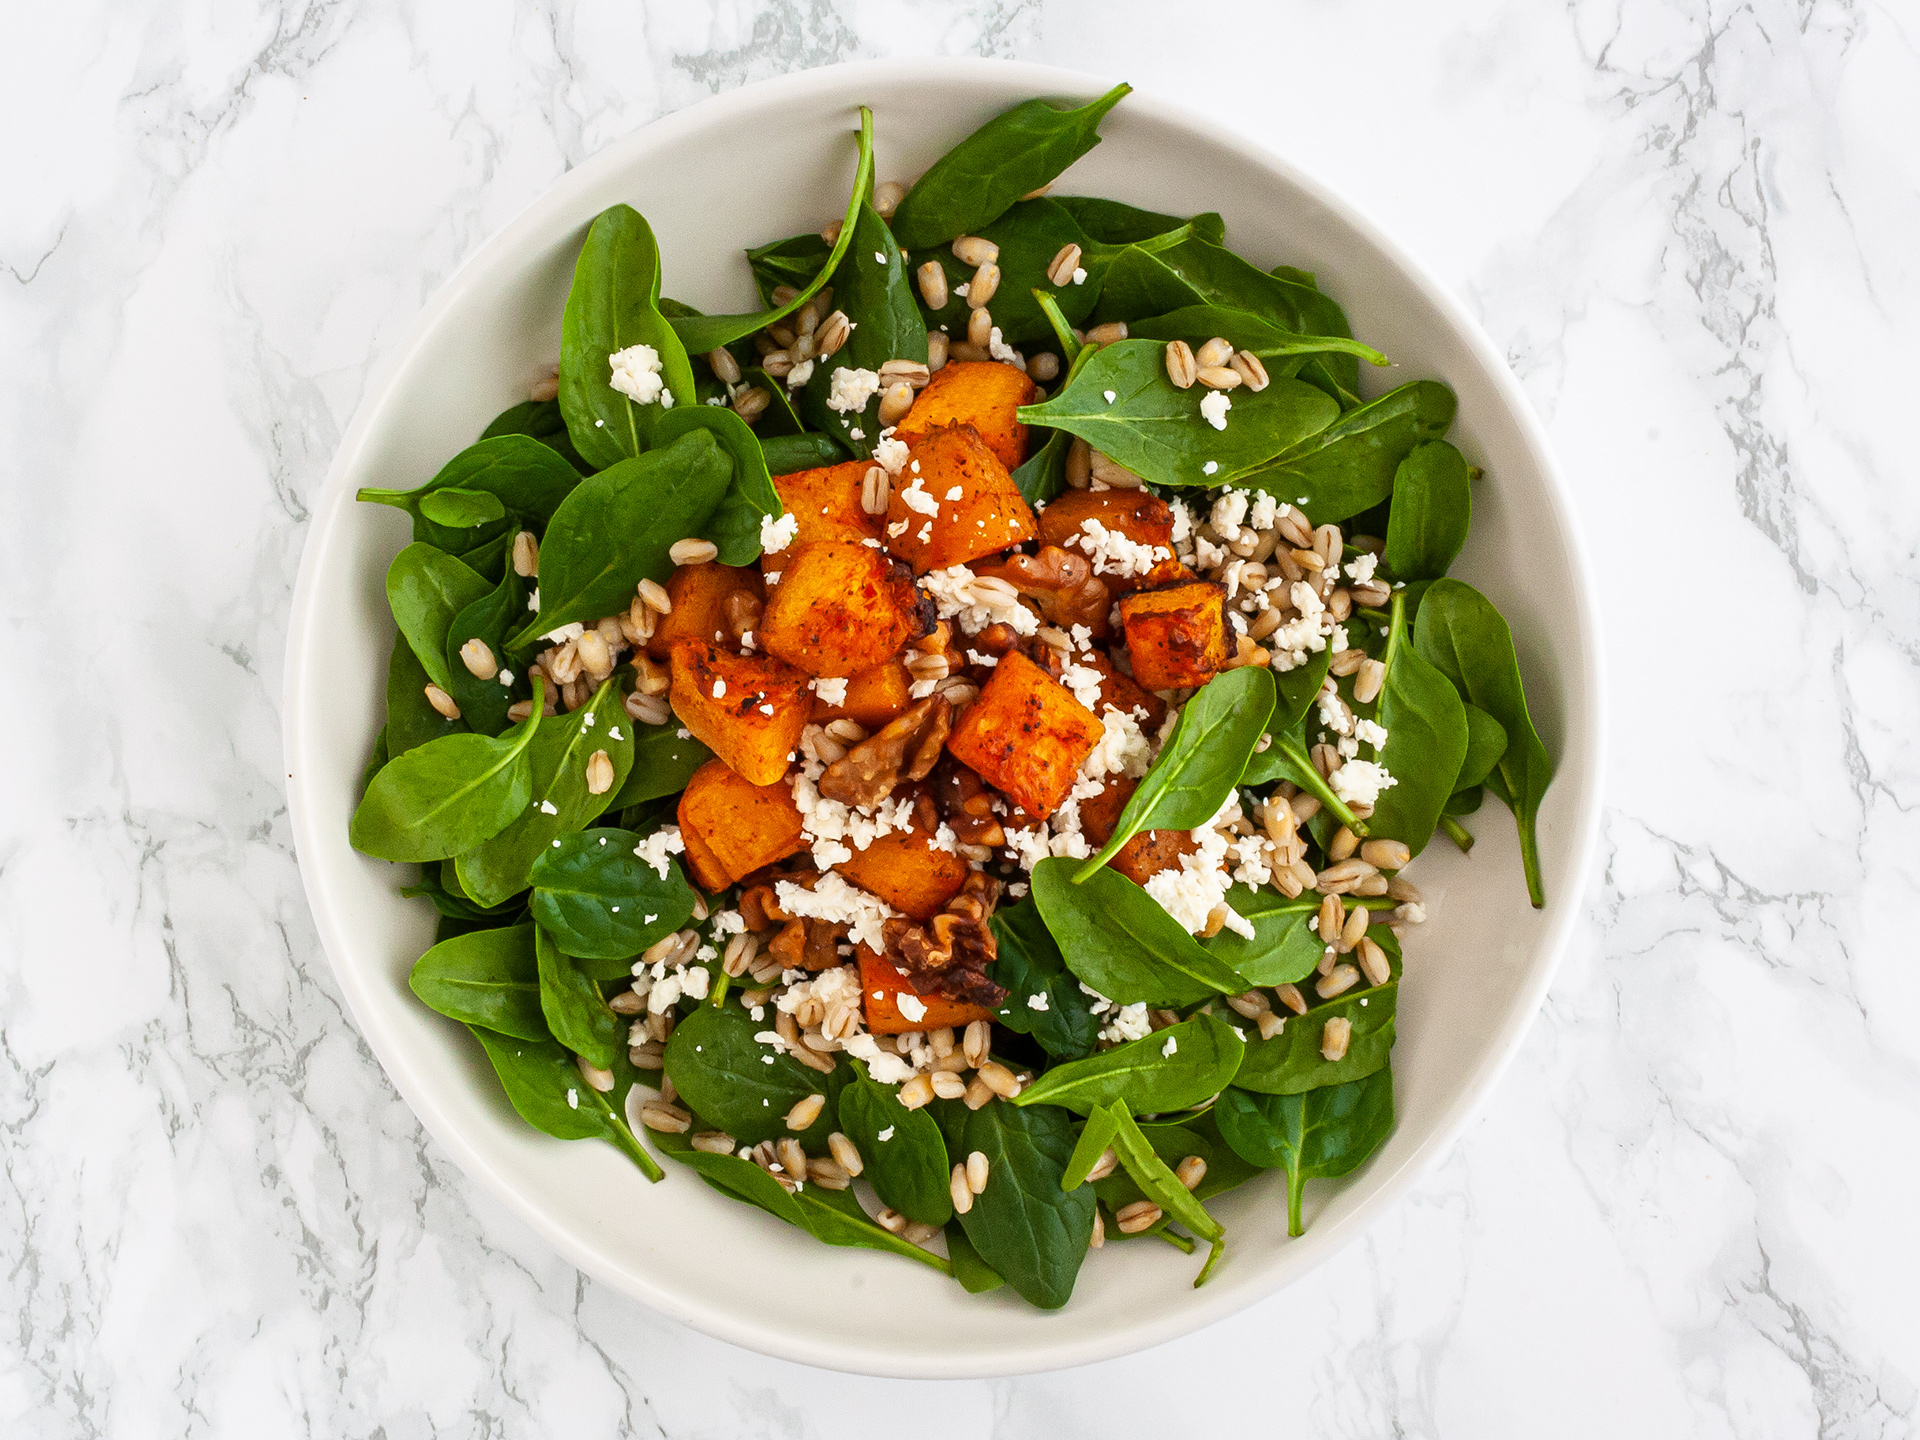 Step 3.1 of Pumpkin Spinach and Feta Salad Recipe